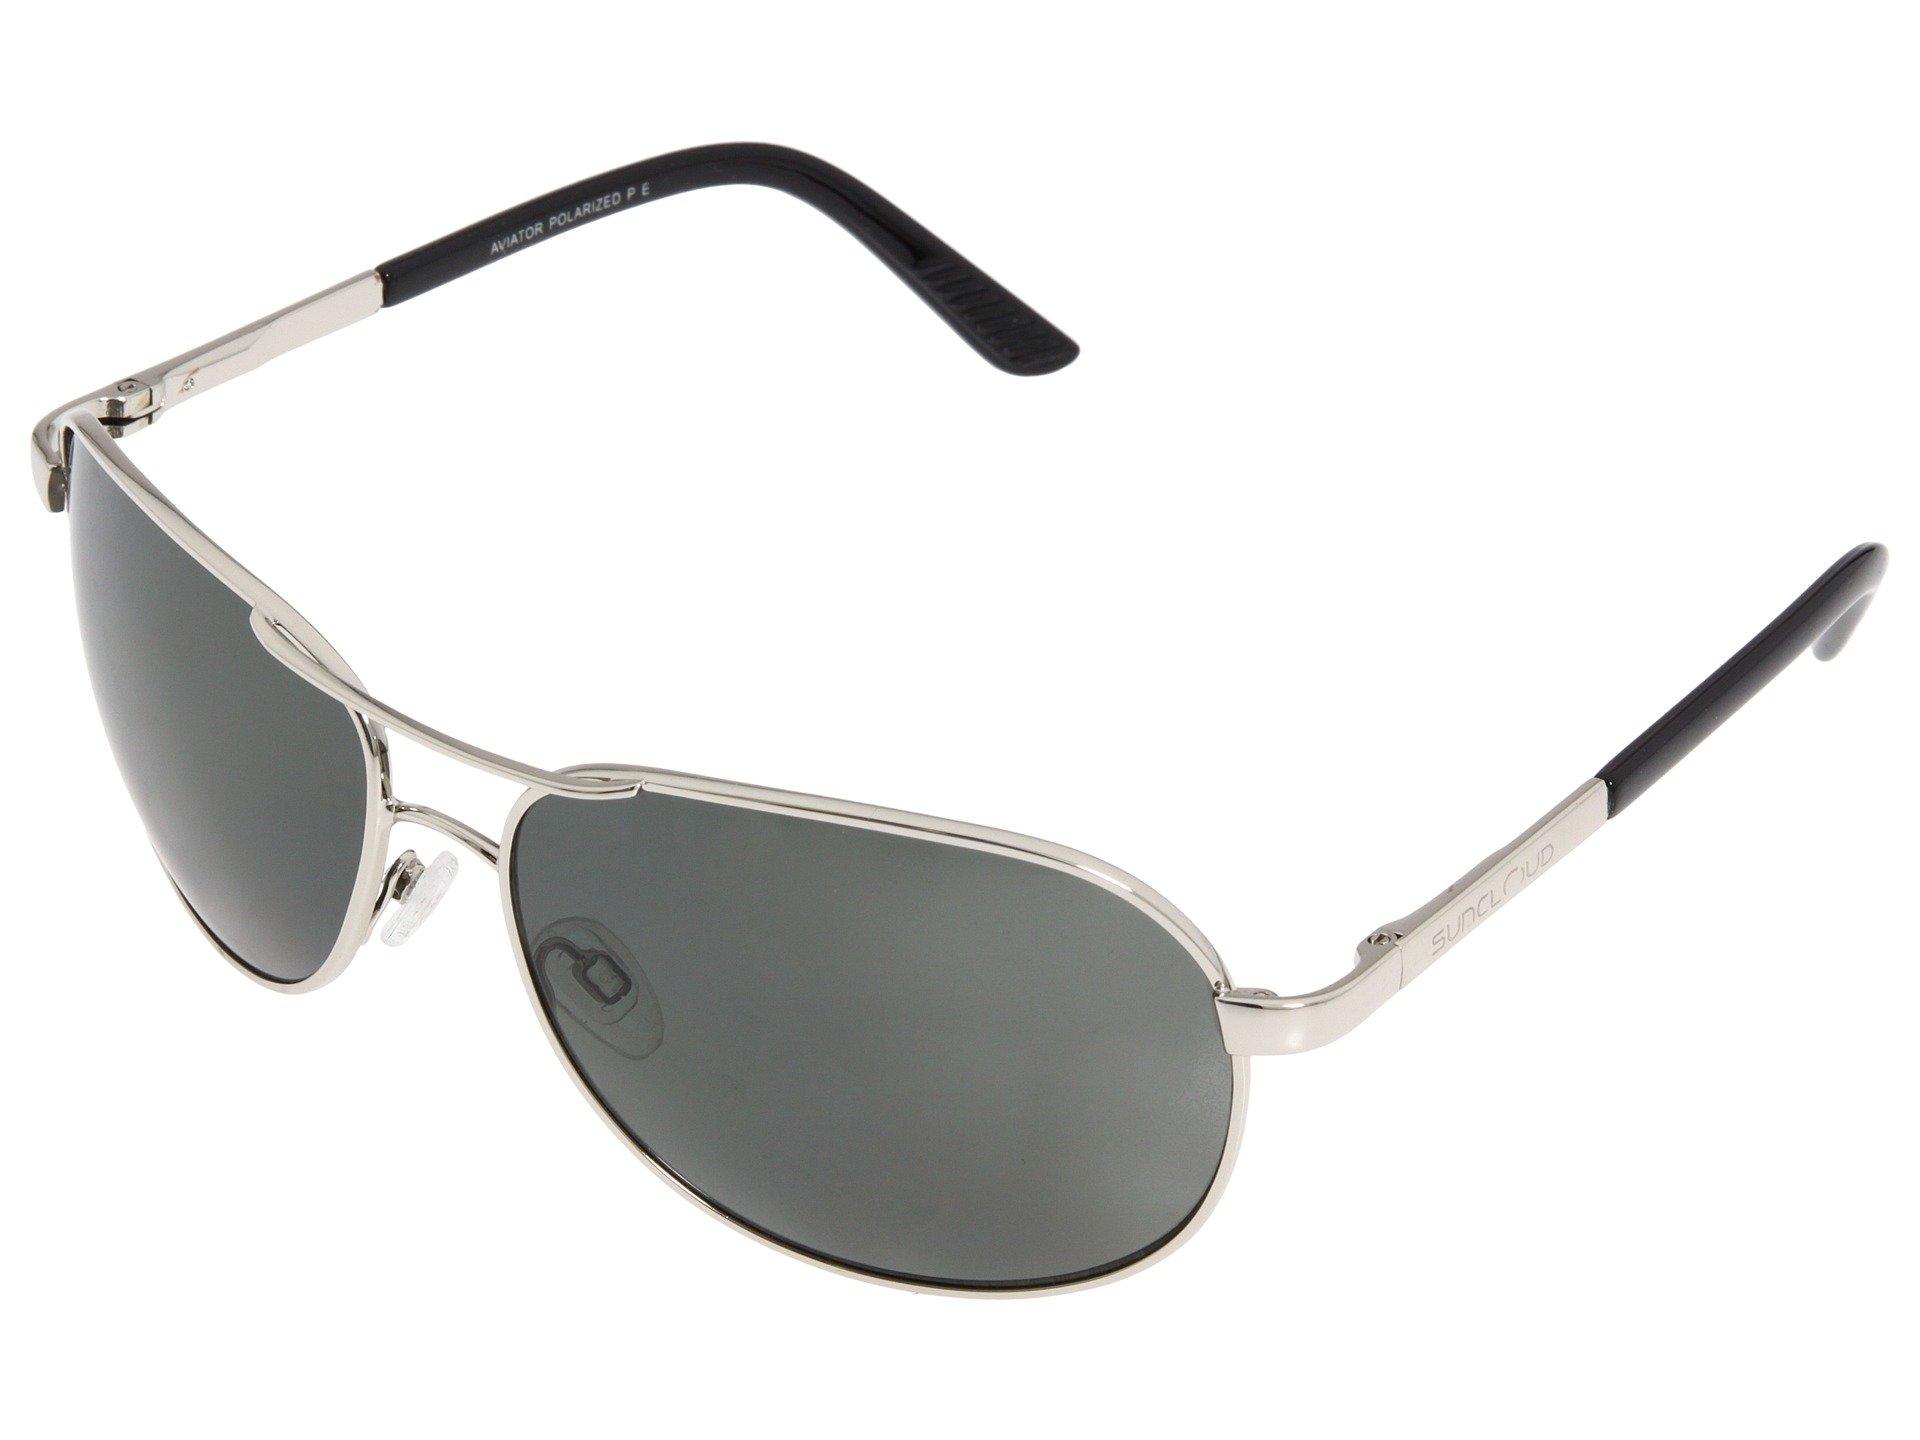 d31b42e3ffd Suncloud Patrol Sunglasses Review